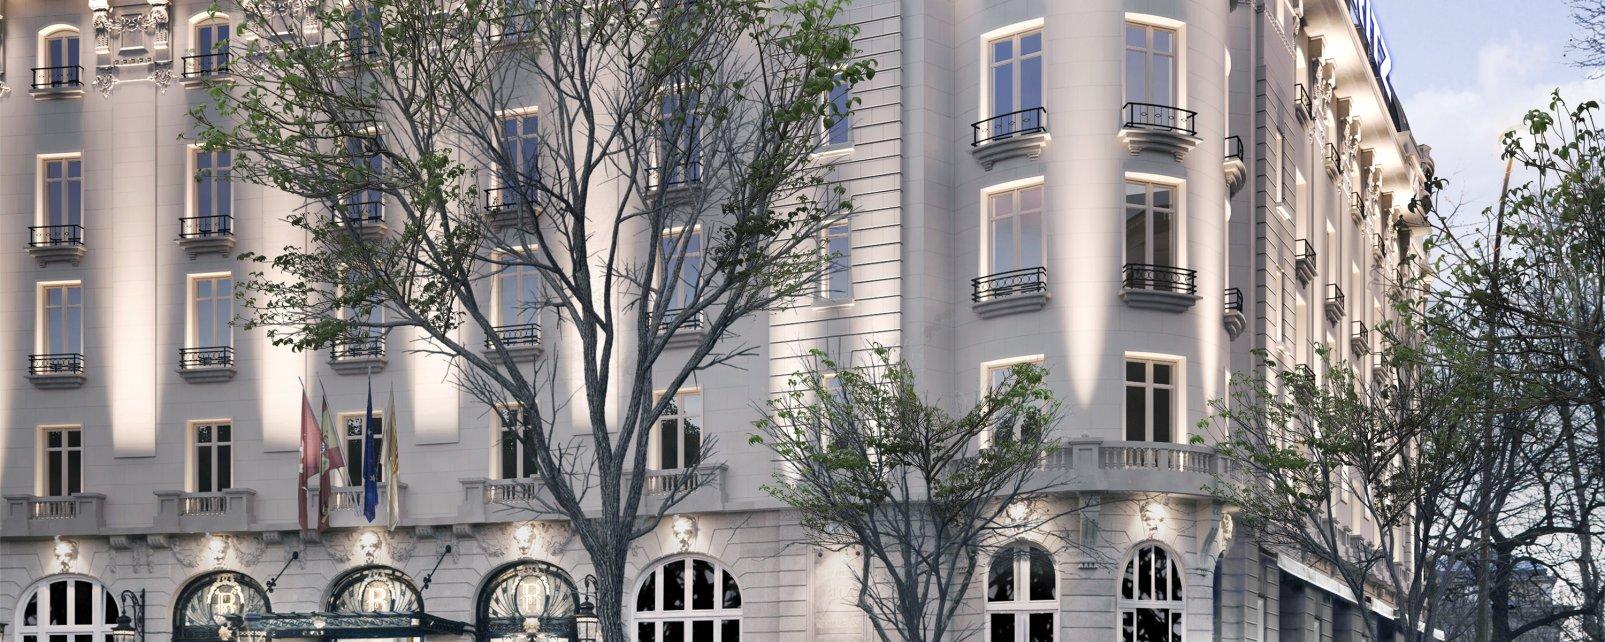 Hotel Ritz Madrid by Belmond Mandarin Oriental